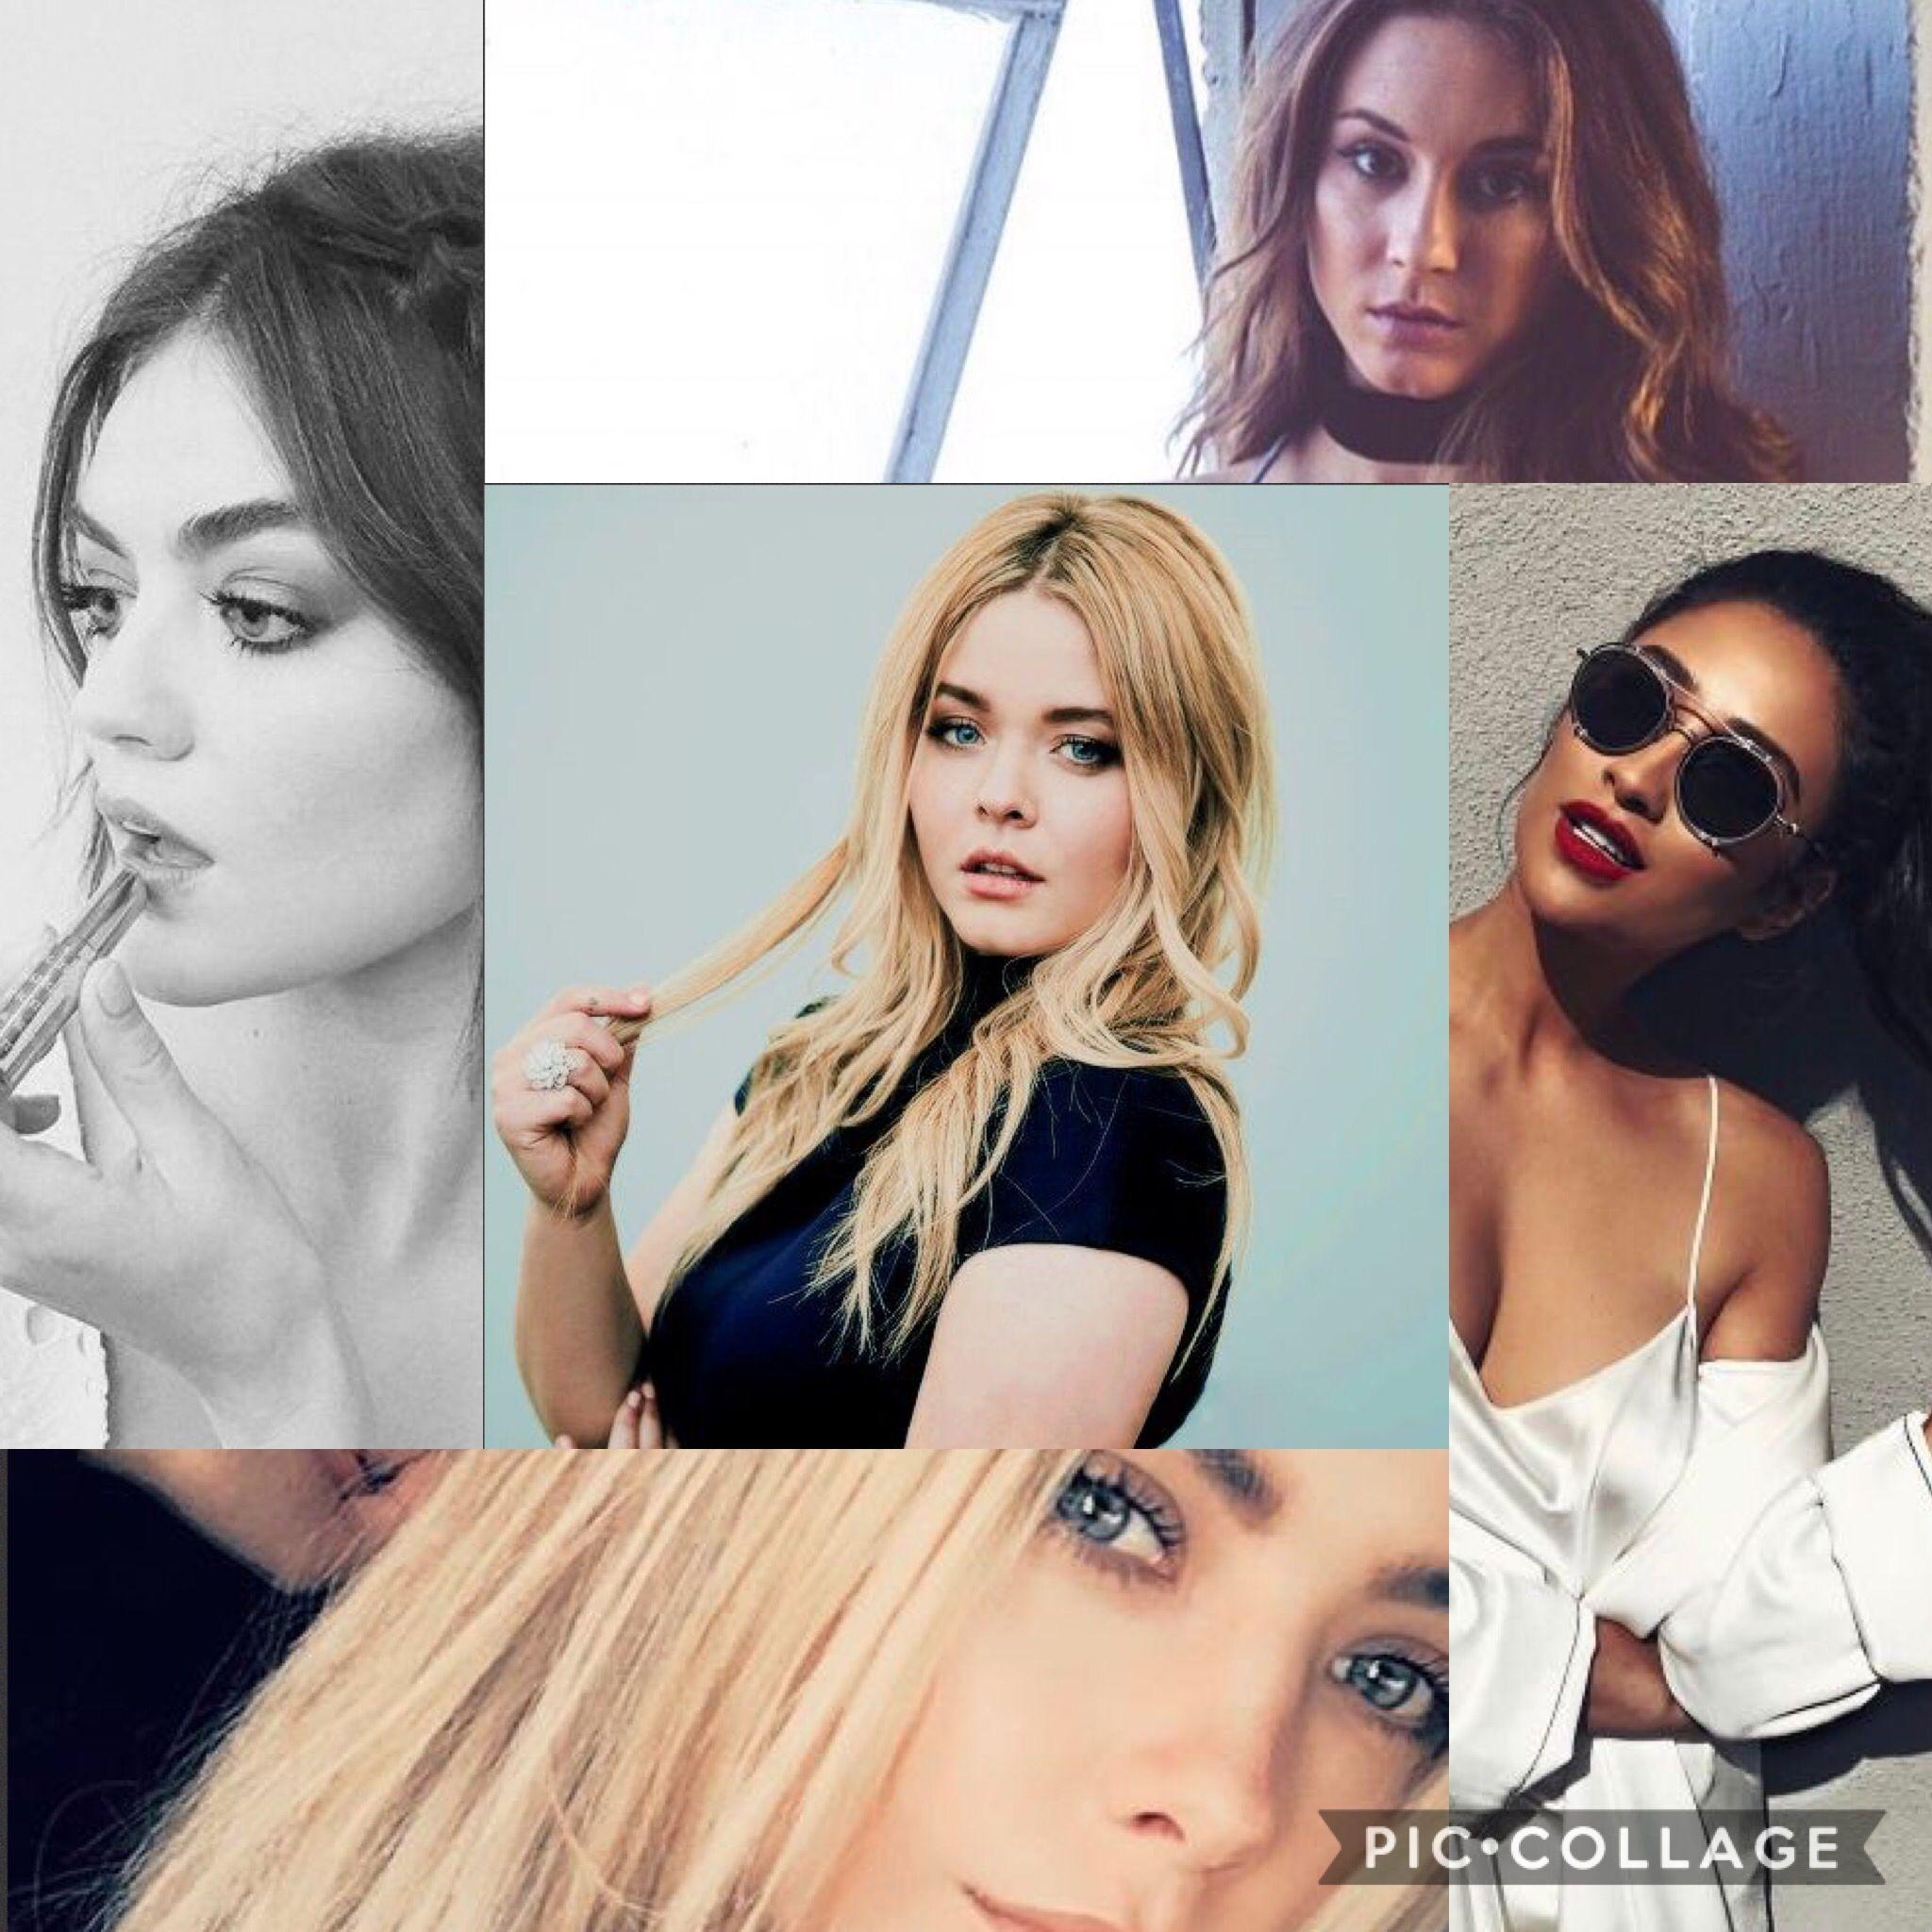 Pin by goga on Troian,Ashley,Lucy,Shay,Sasha,Janel ...